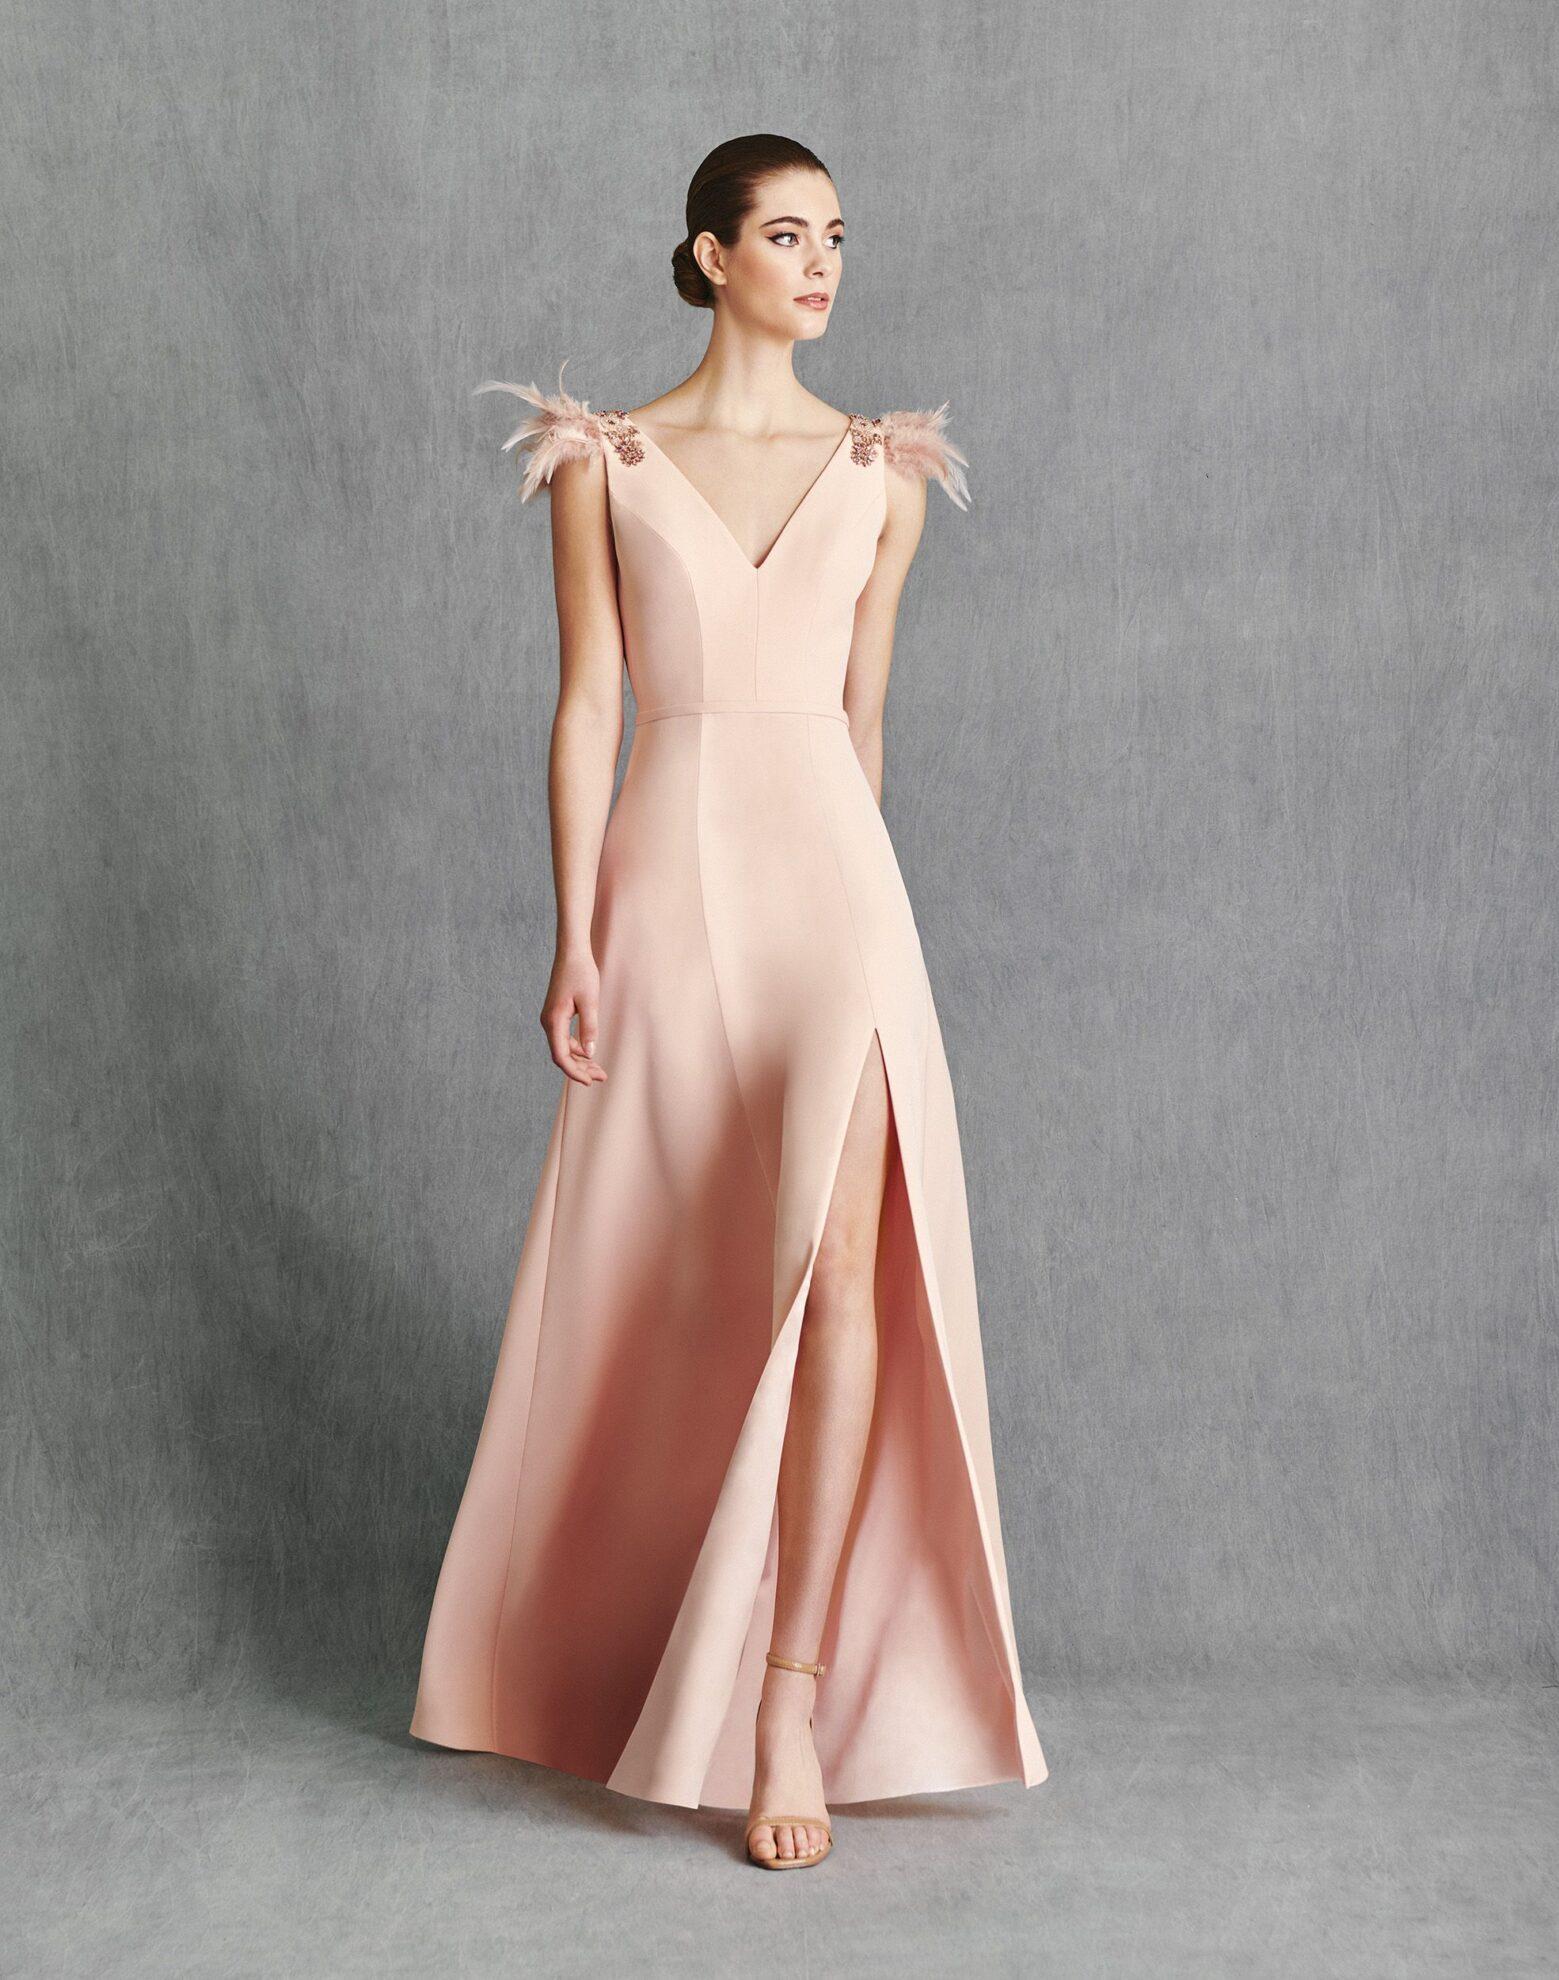 Vestidos de Fiesta 2020 - Silvia Fernandez Atelier - IANA